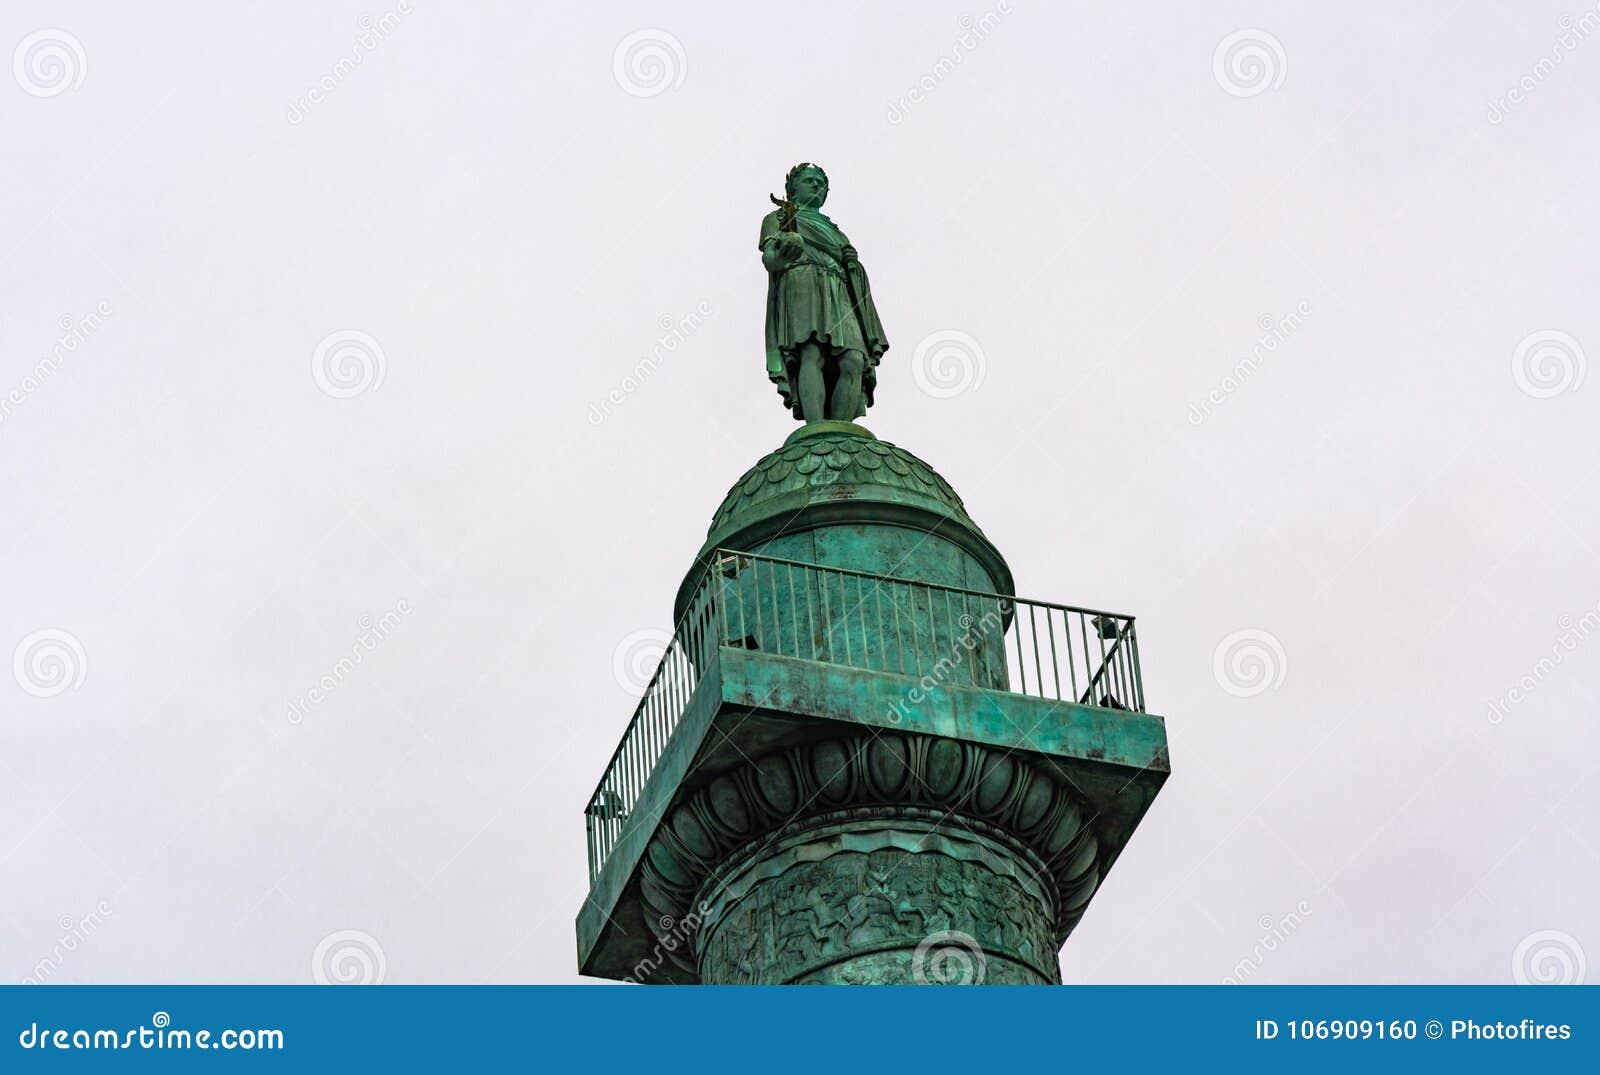 Statua na górze Vendome kolumny w Paryż